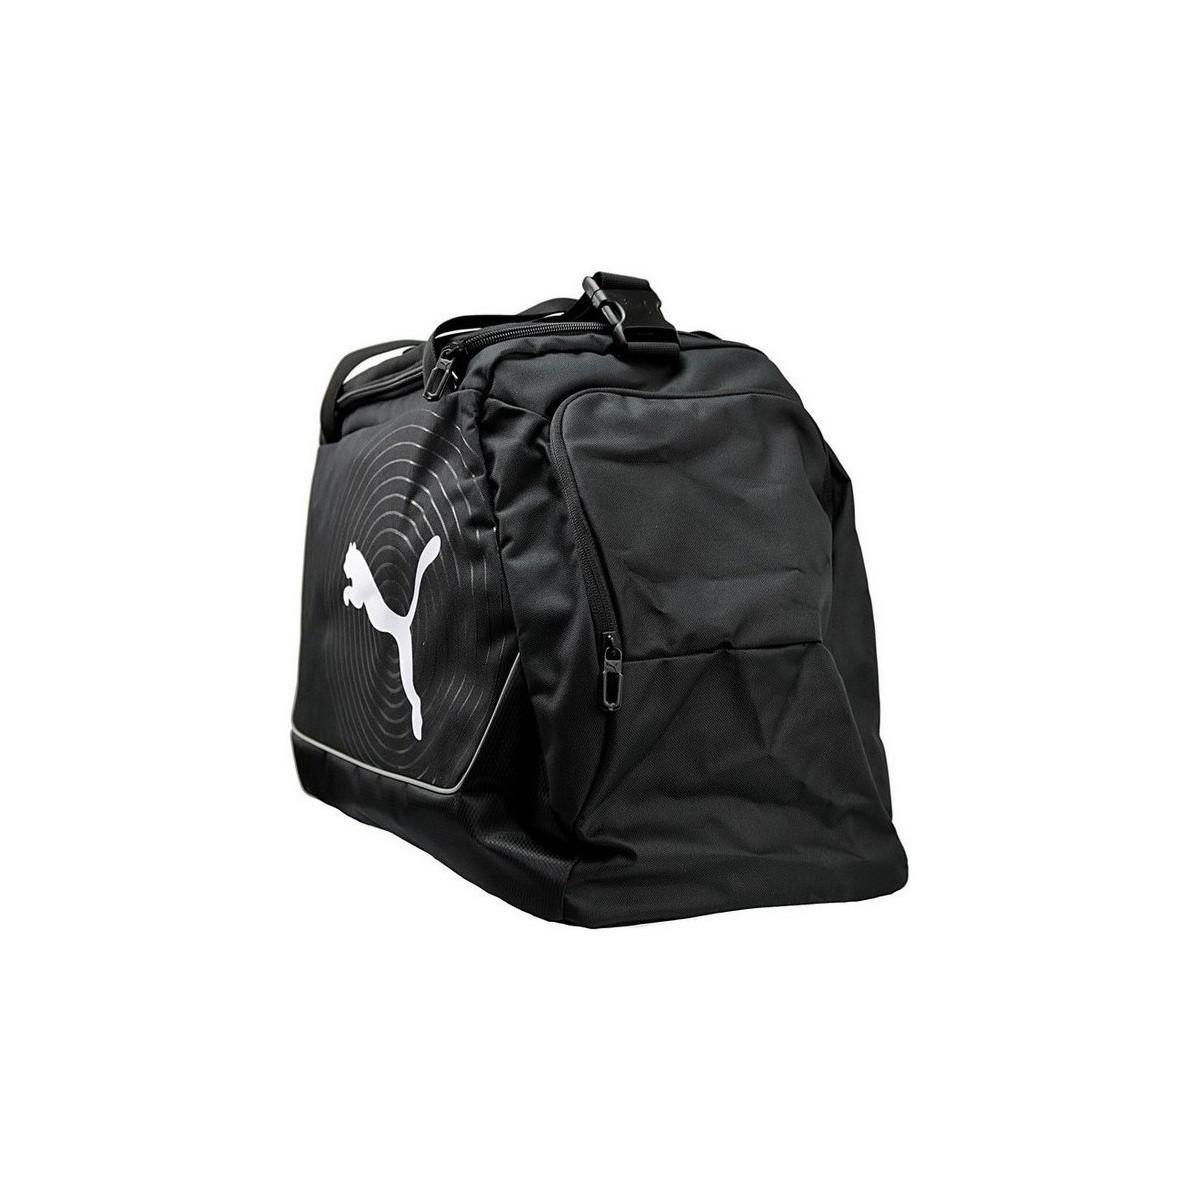 PUMA Evopower Medium Bag Men s Sports Bag In Black in Black for Men ... 5a3e97d2d5024